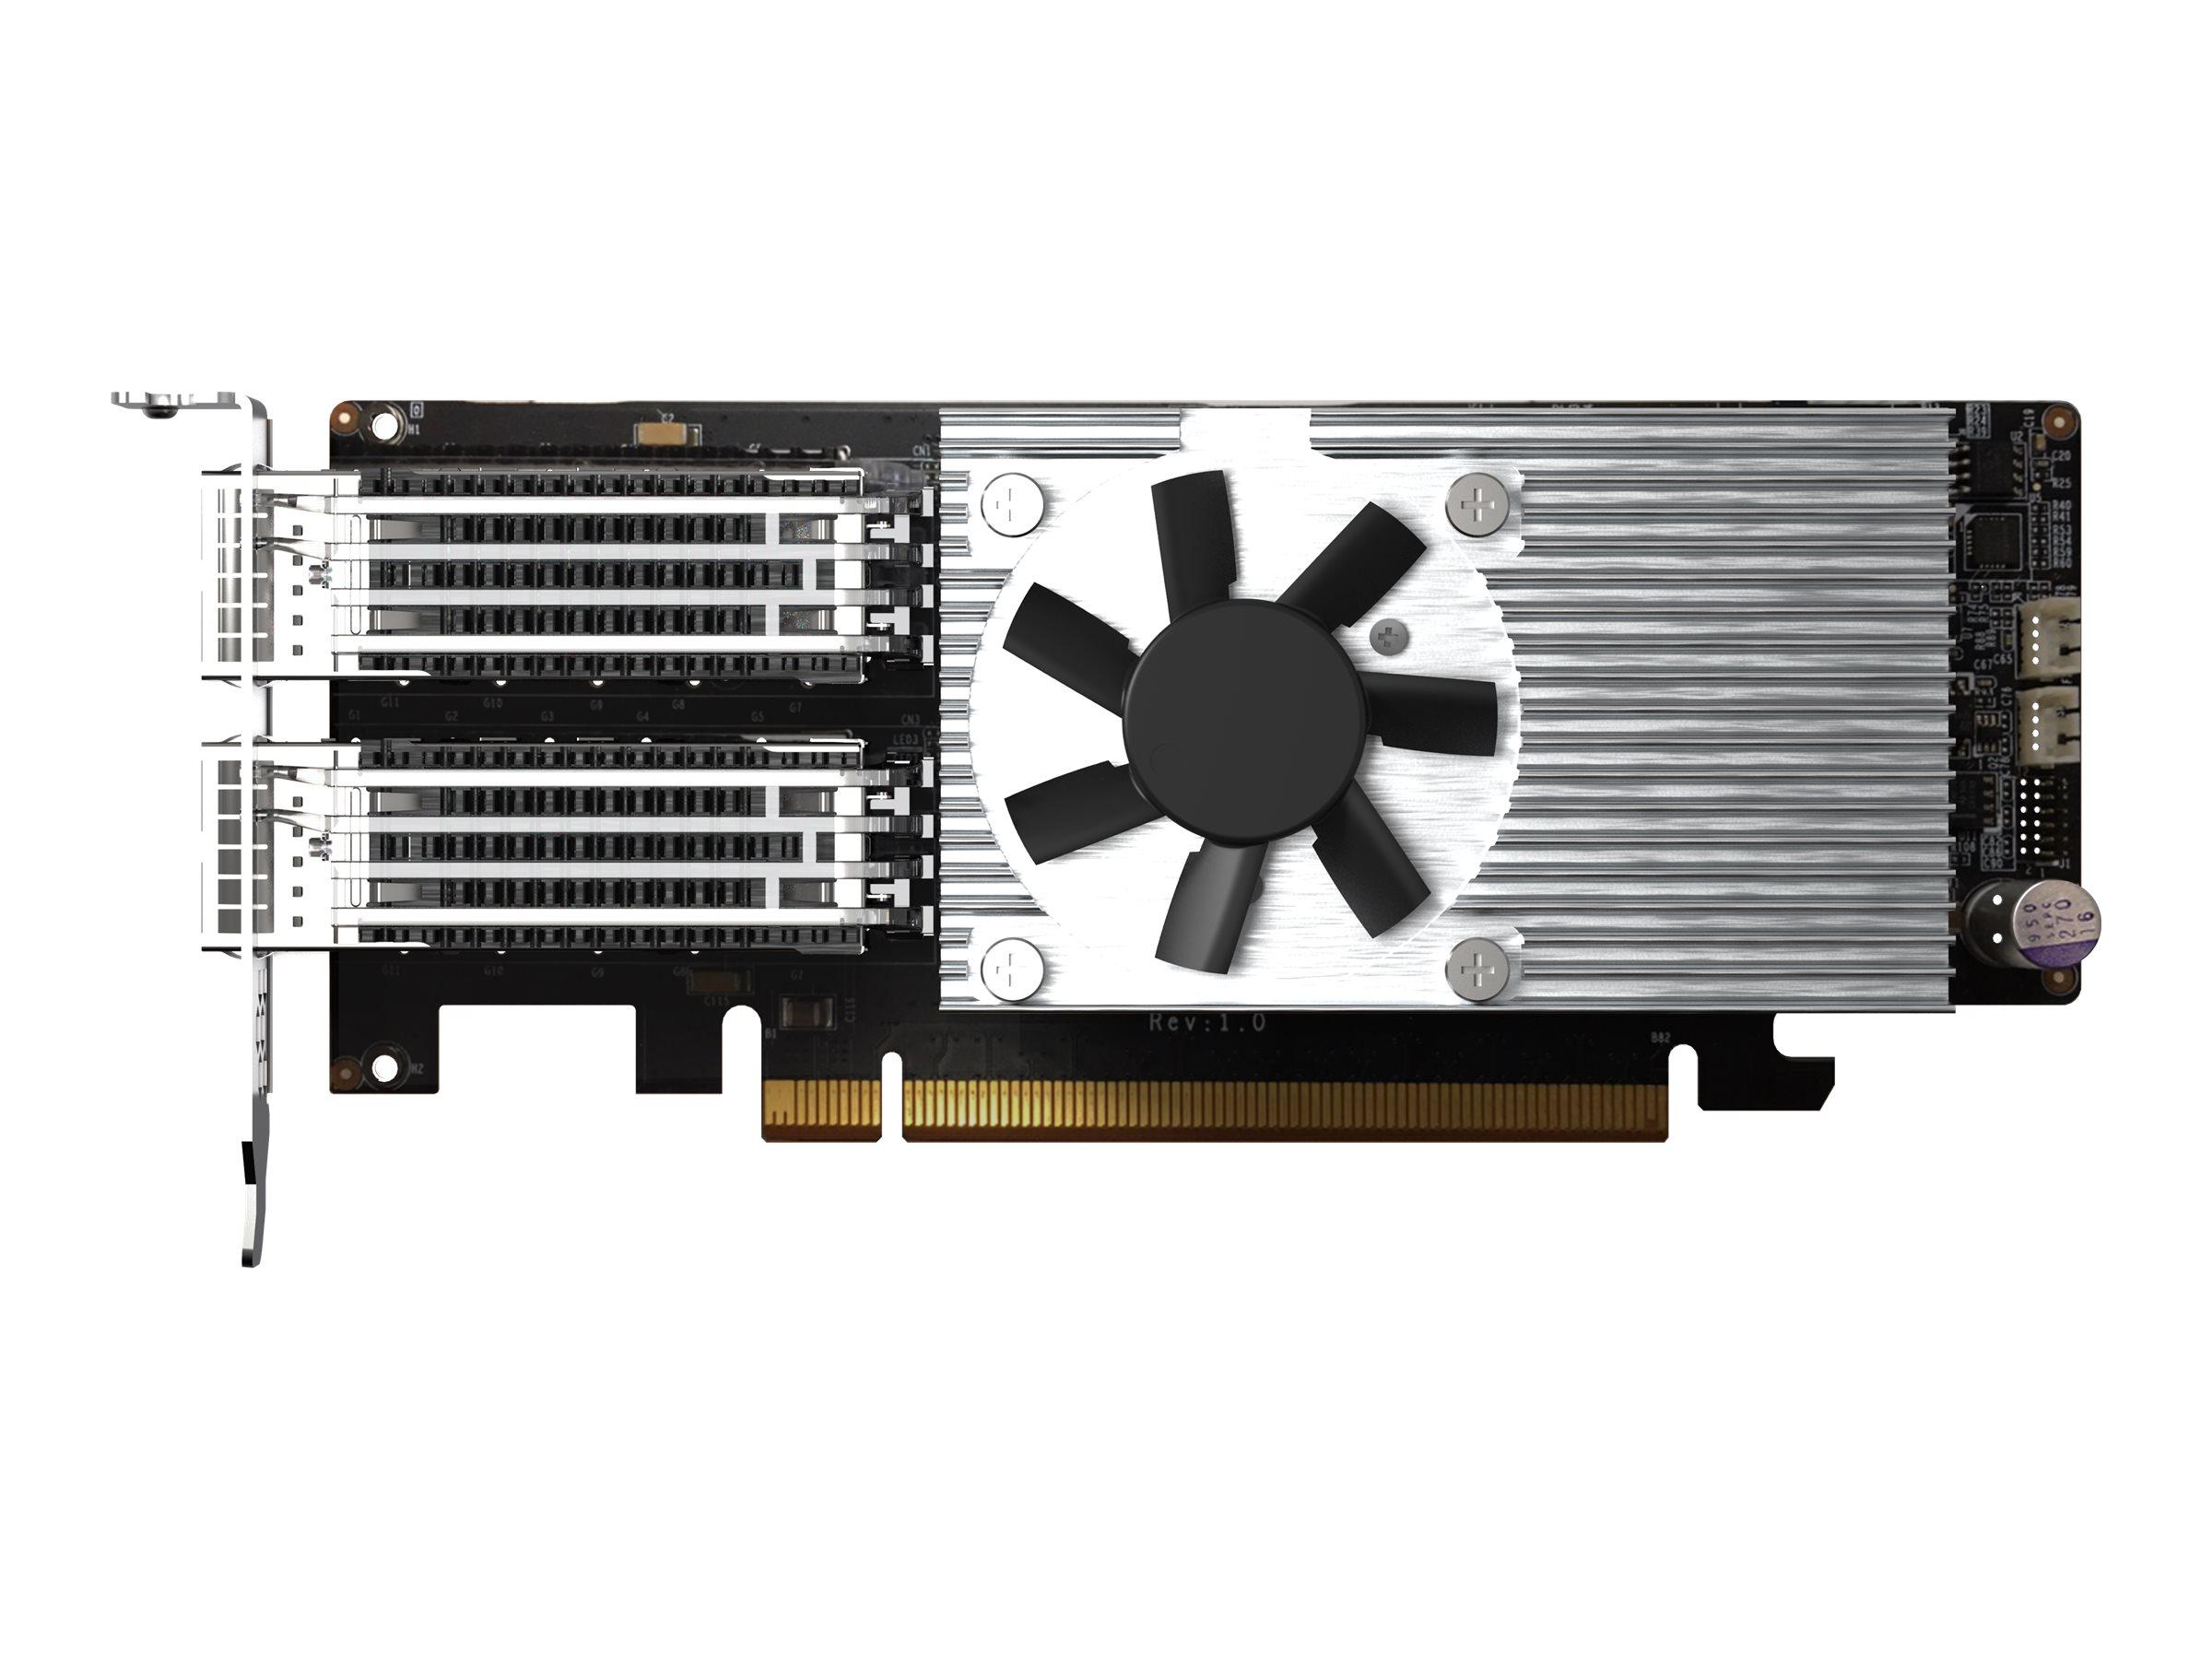 QNAP QXG-100G2SF-E810 - network adapter - PCIe 4.0 x16 - 100 Gigabit QSFP28 x 2